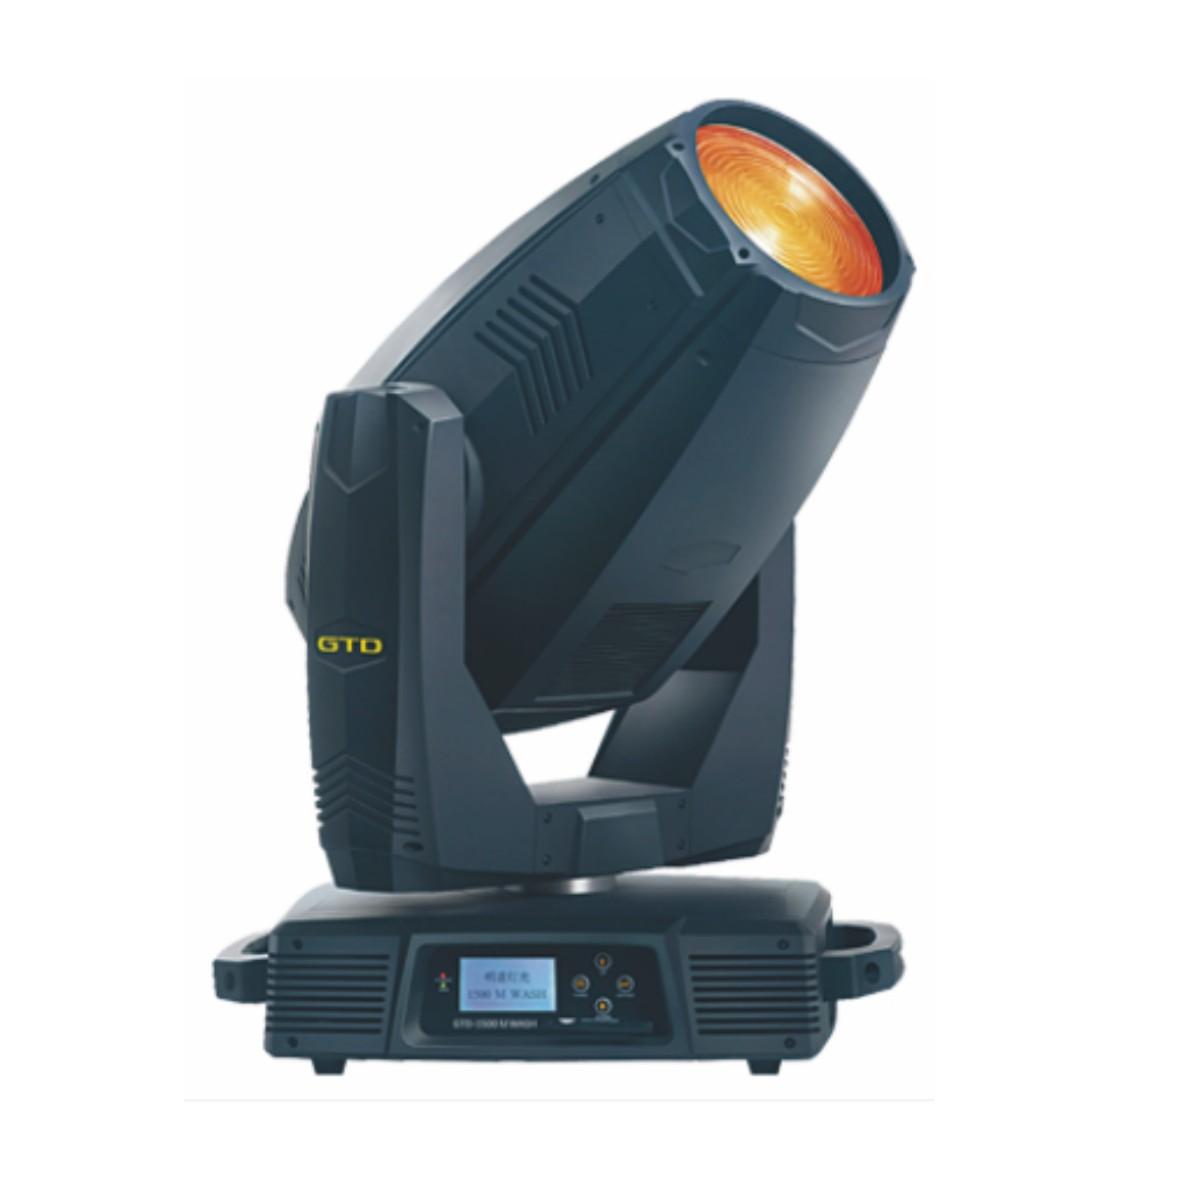 GTD-1500M WASH 电脑摇头染色灯